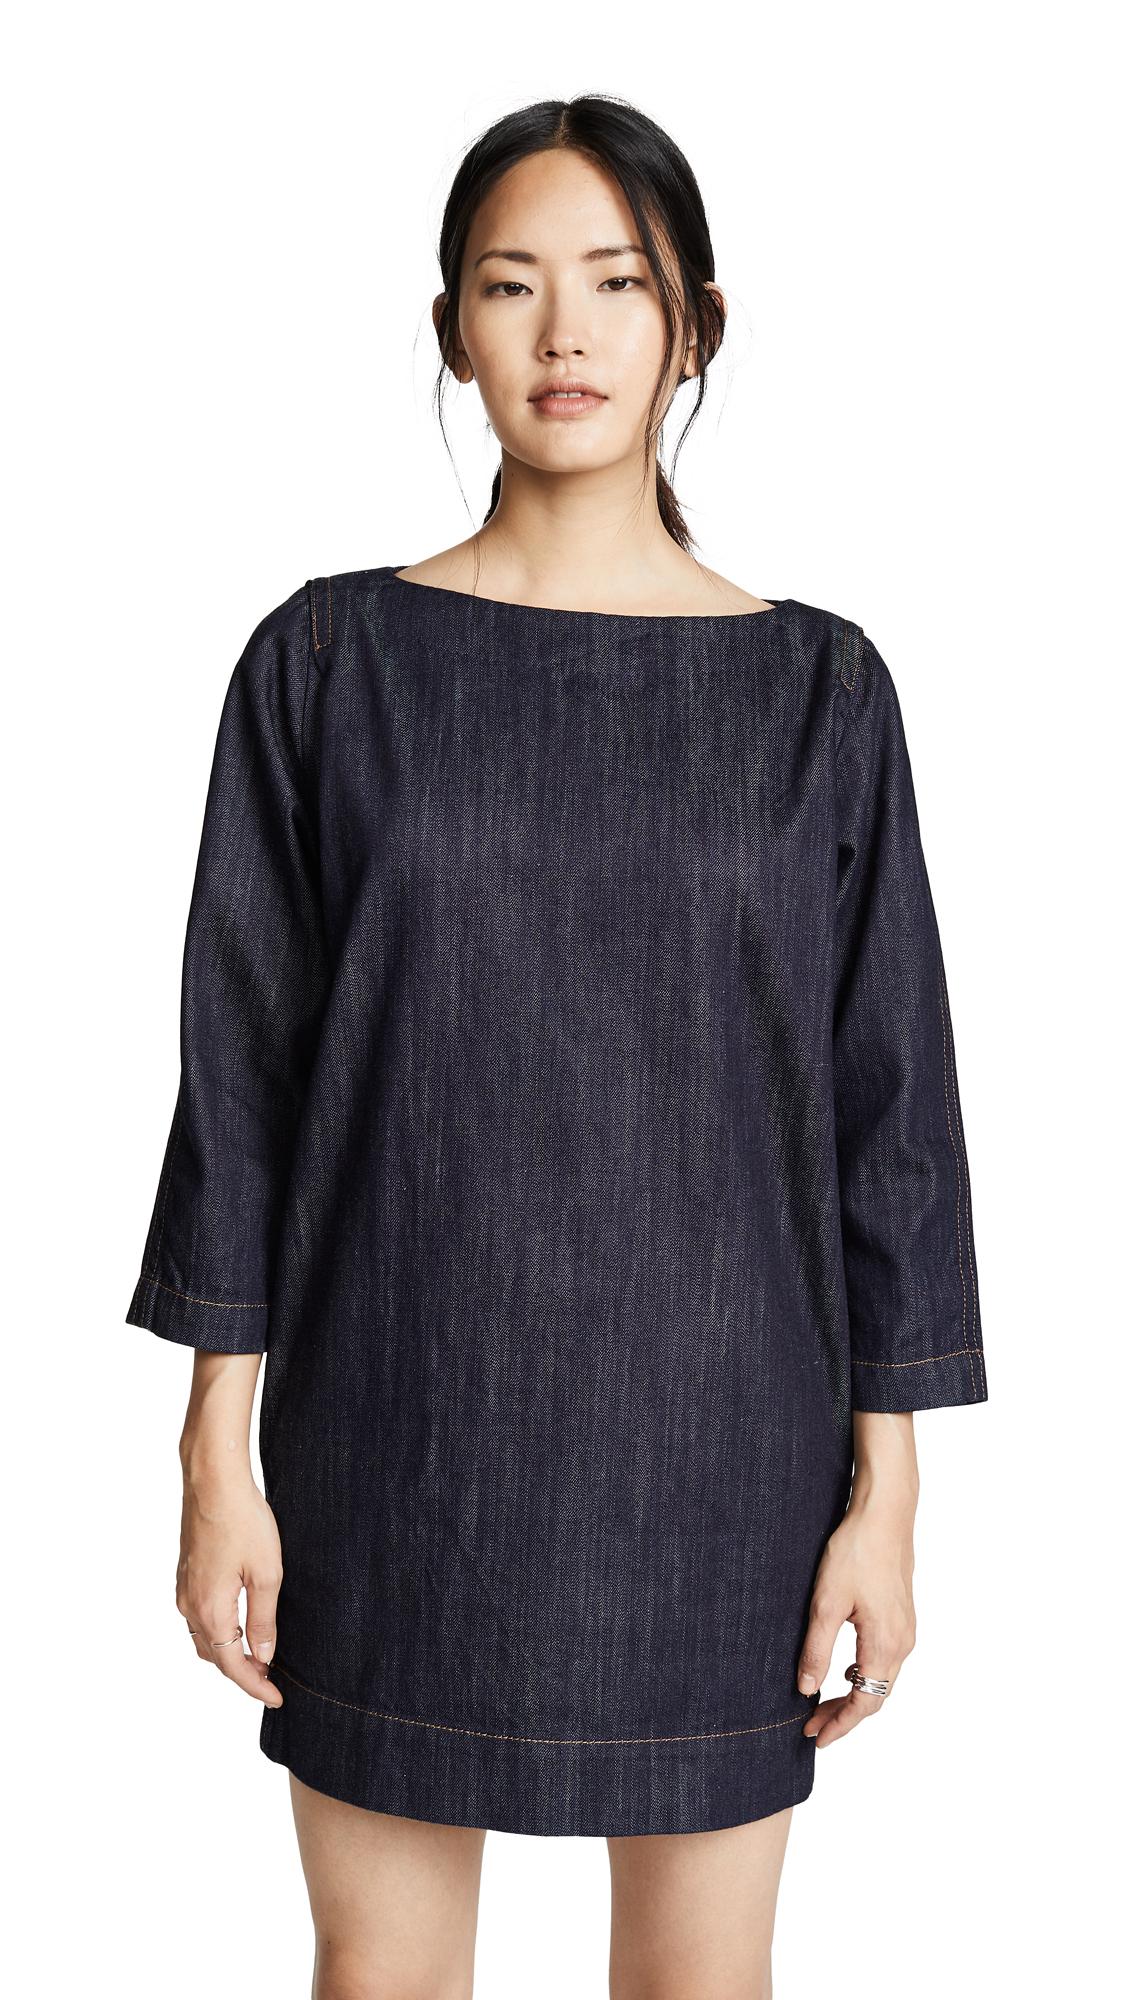 Marc Jacobs Denim Dress In Indigo